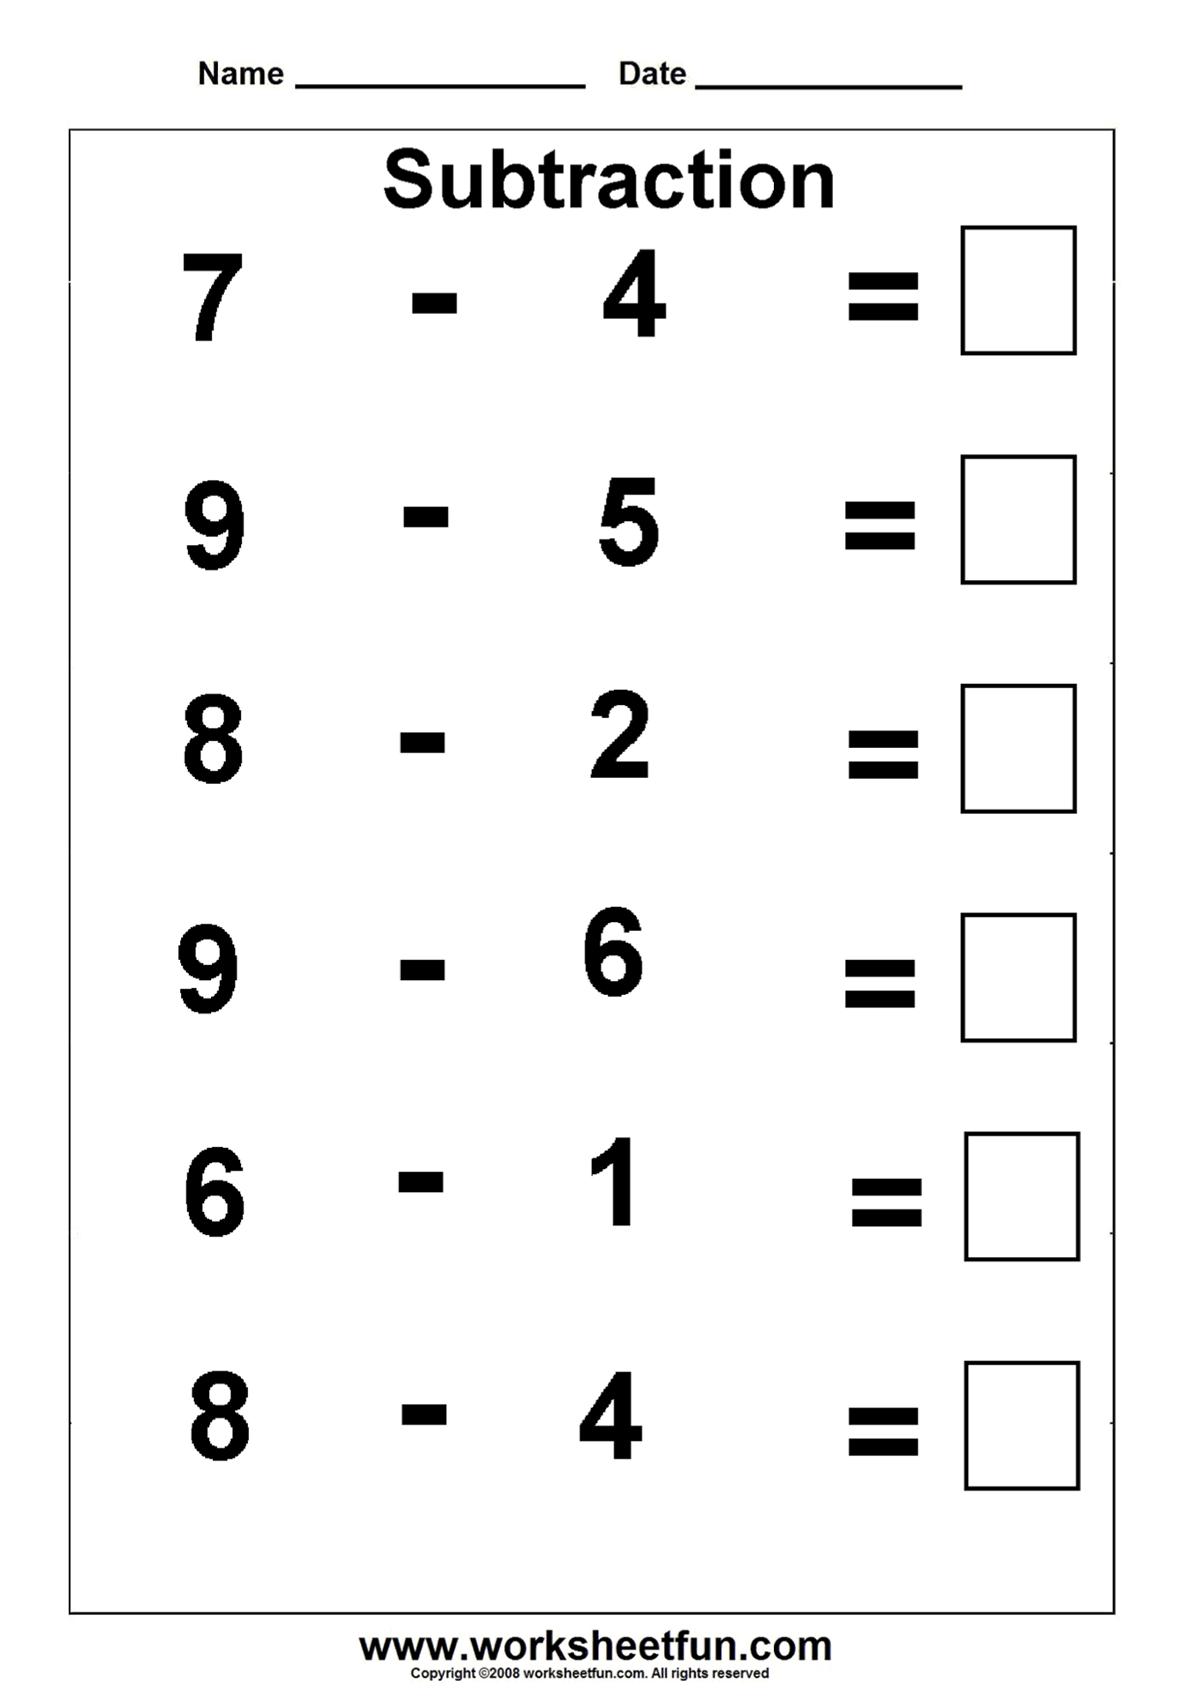 small resolution of Subtraction worksheet   Kindergarten math worksheets free